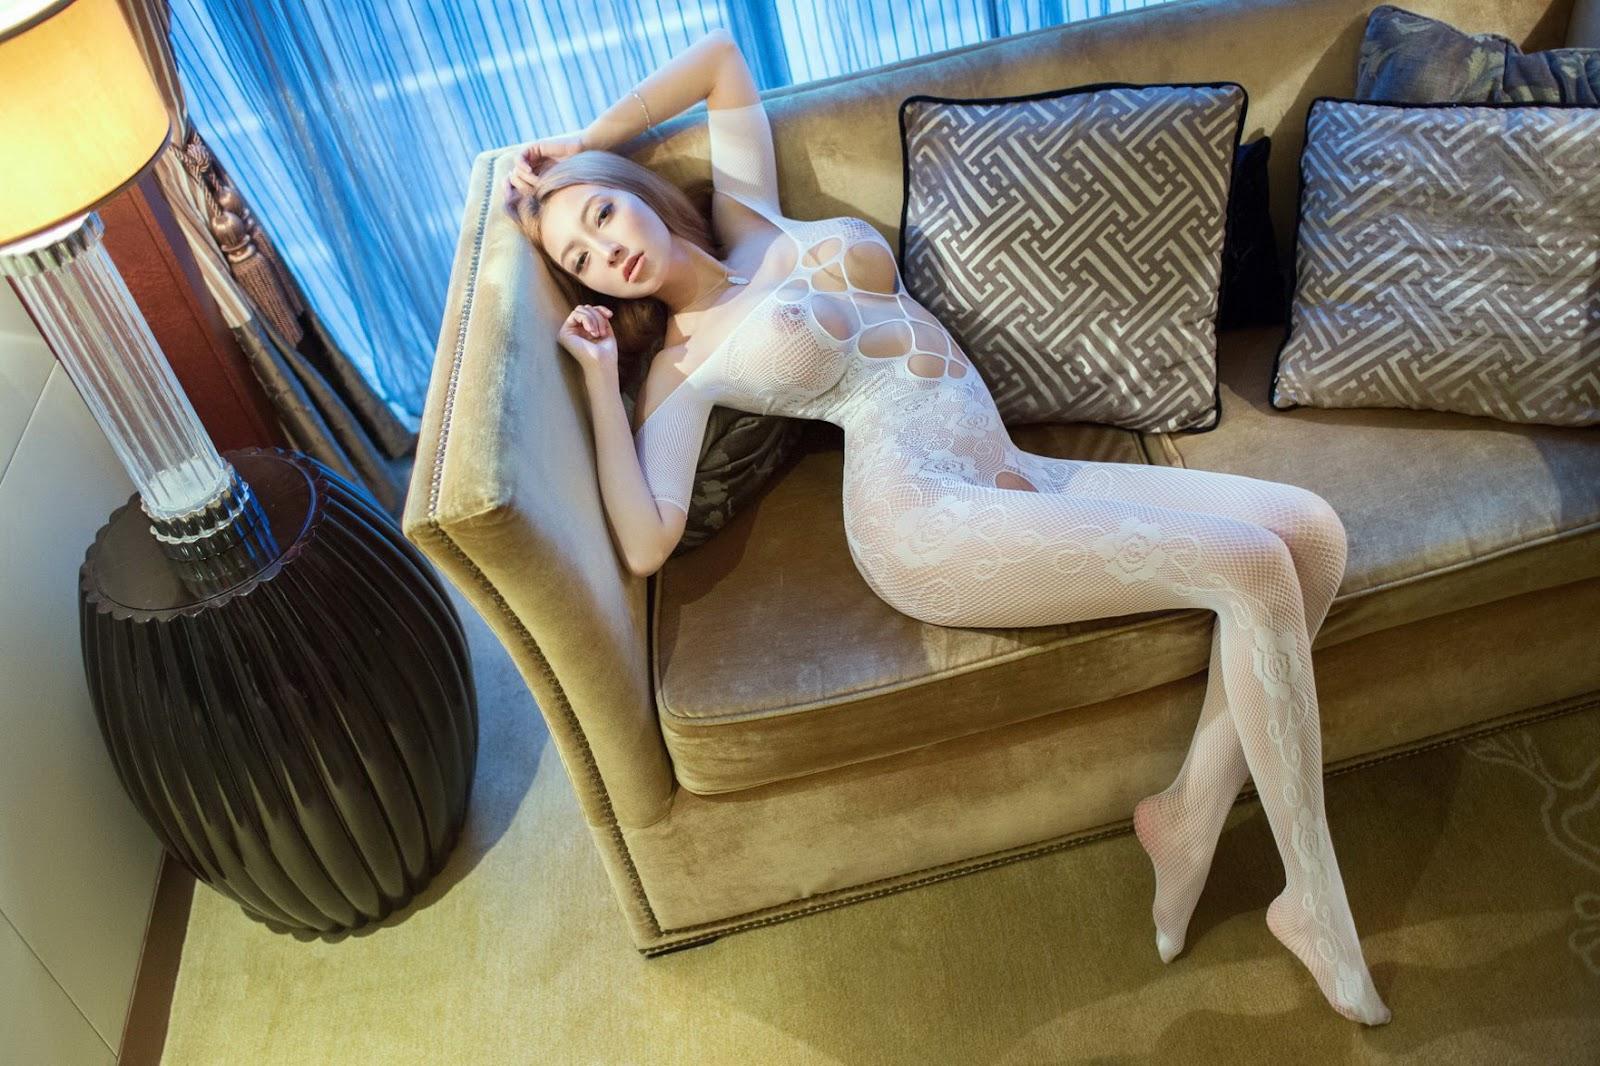 48%2B%252816%2529 - Sexy Girl Nude TUIGIRL NO.48 Model